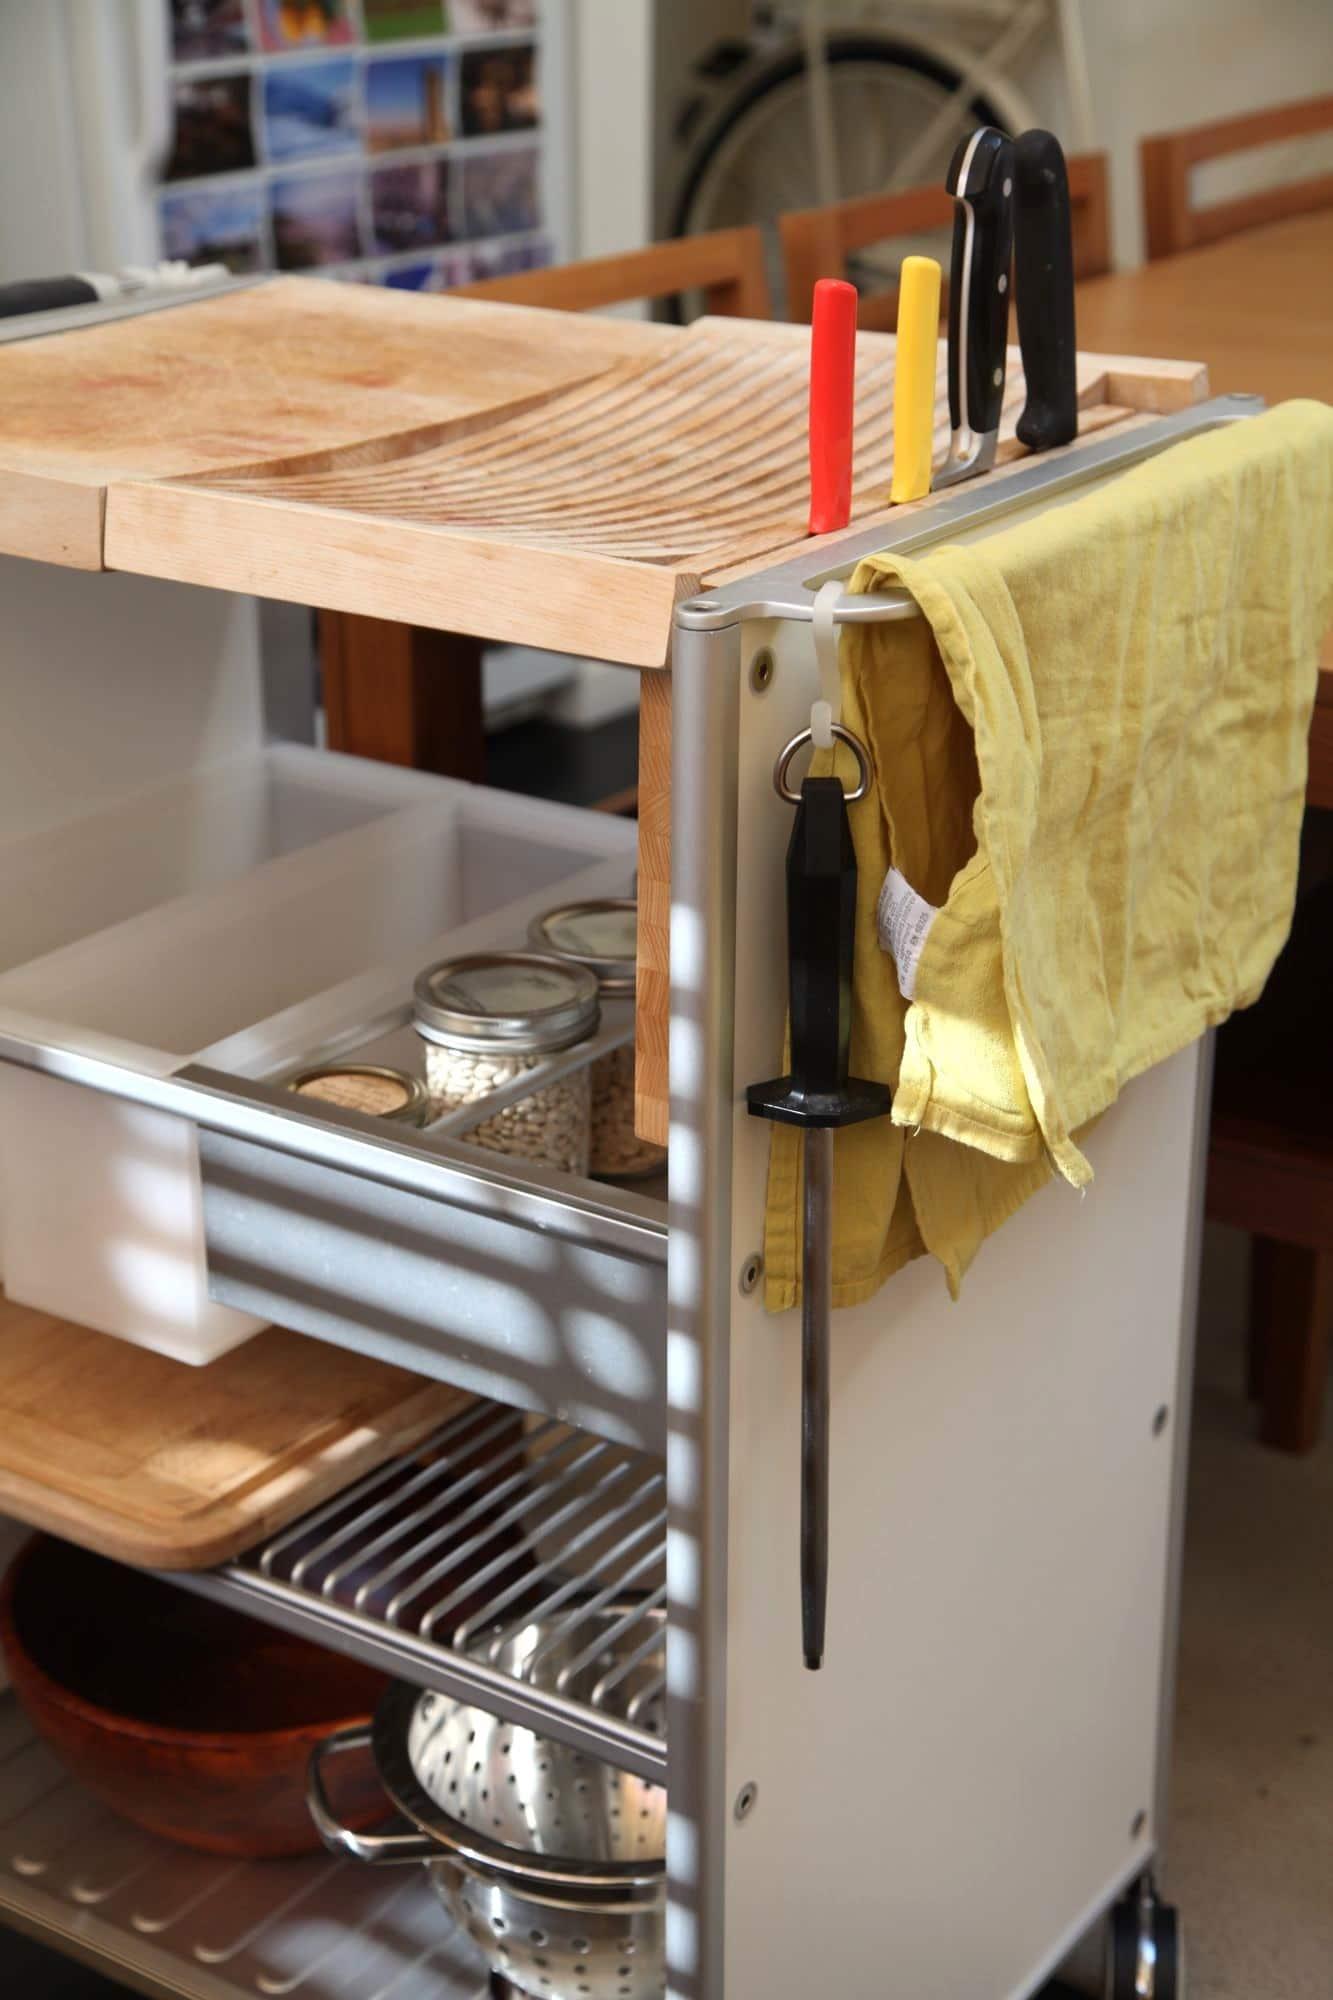 Cheyenne's Spare City Kitchen: gallery image 10